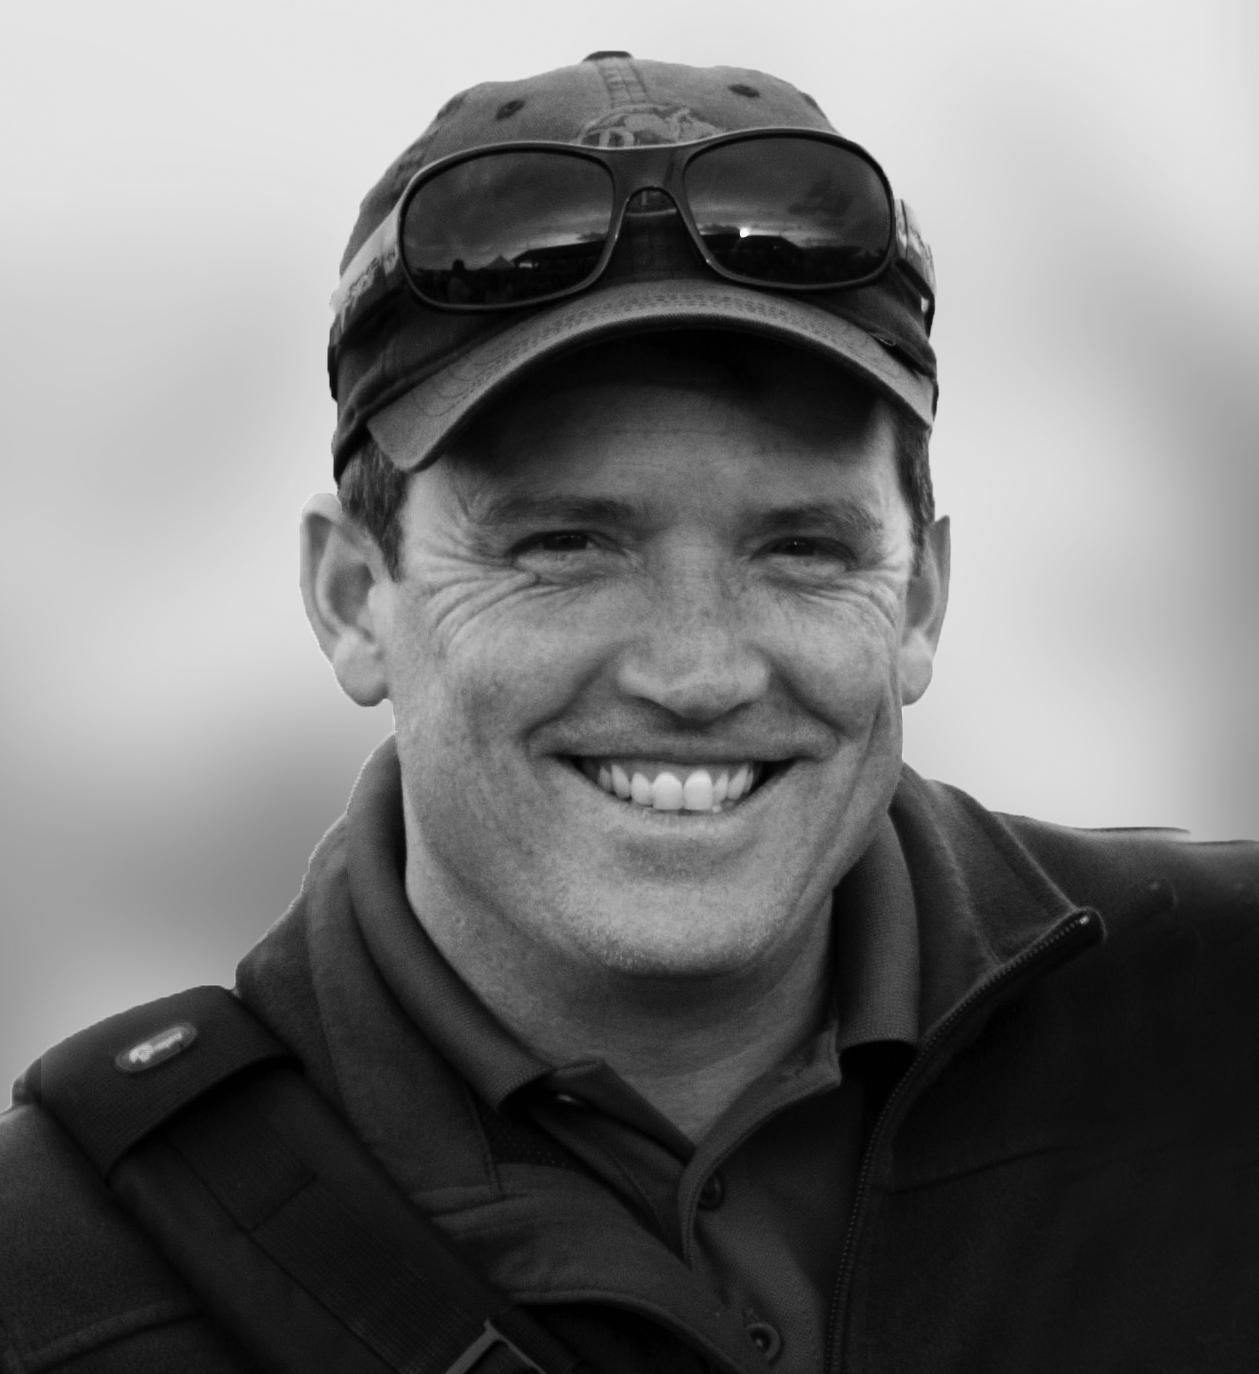 Brian Schott